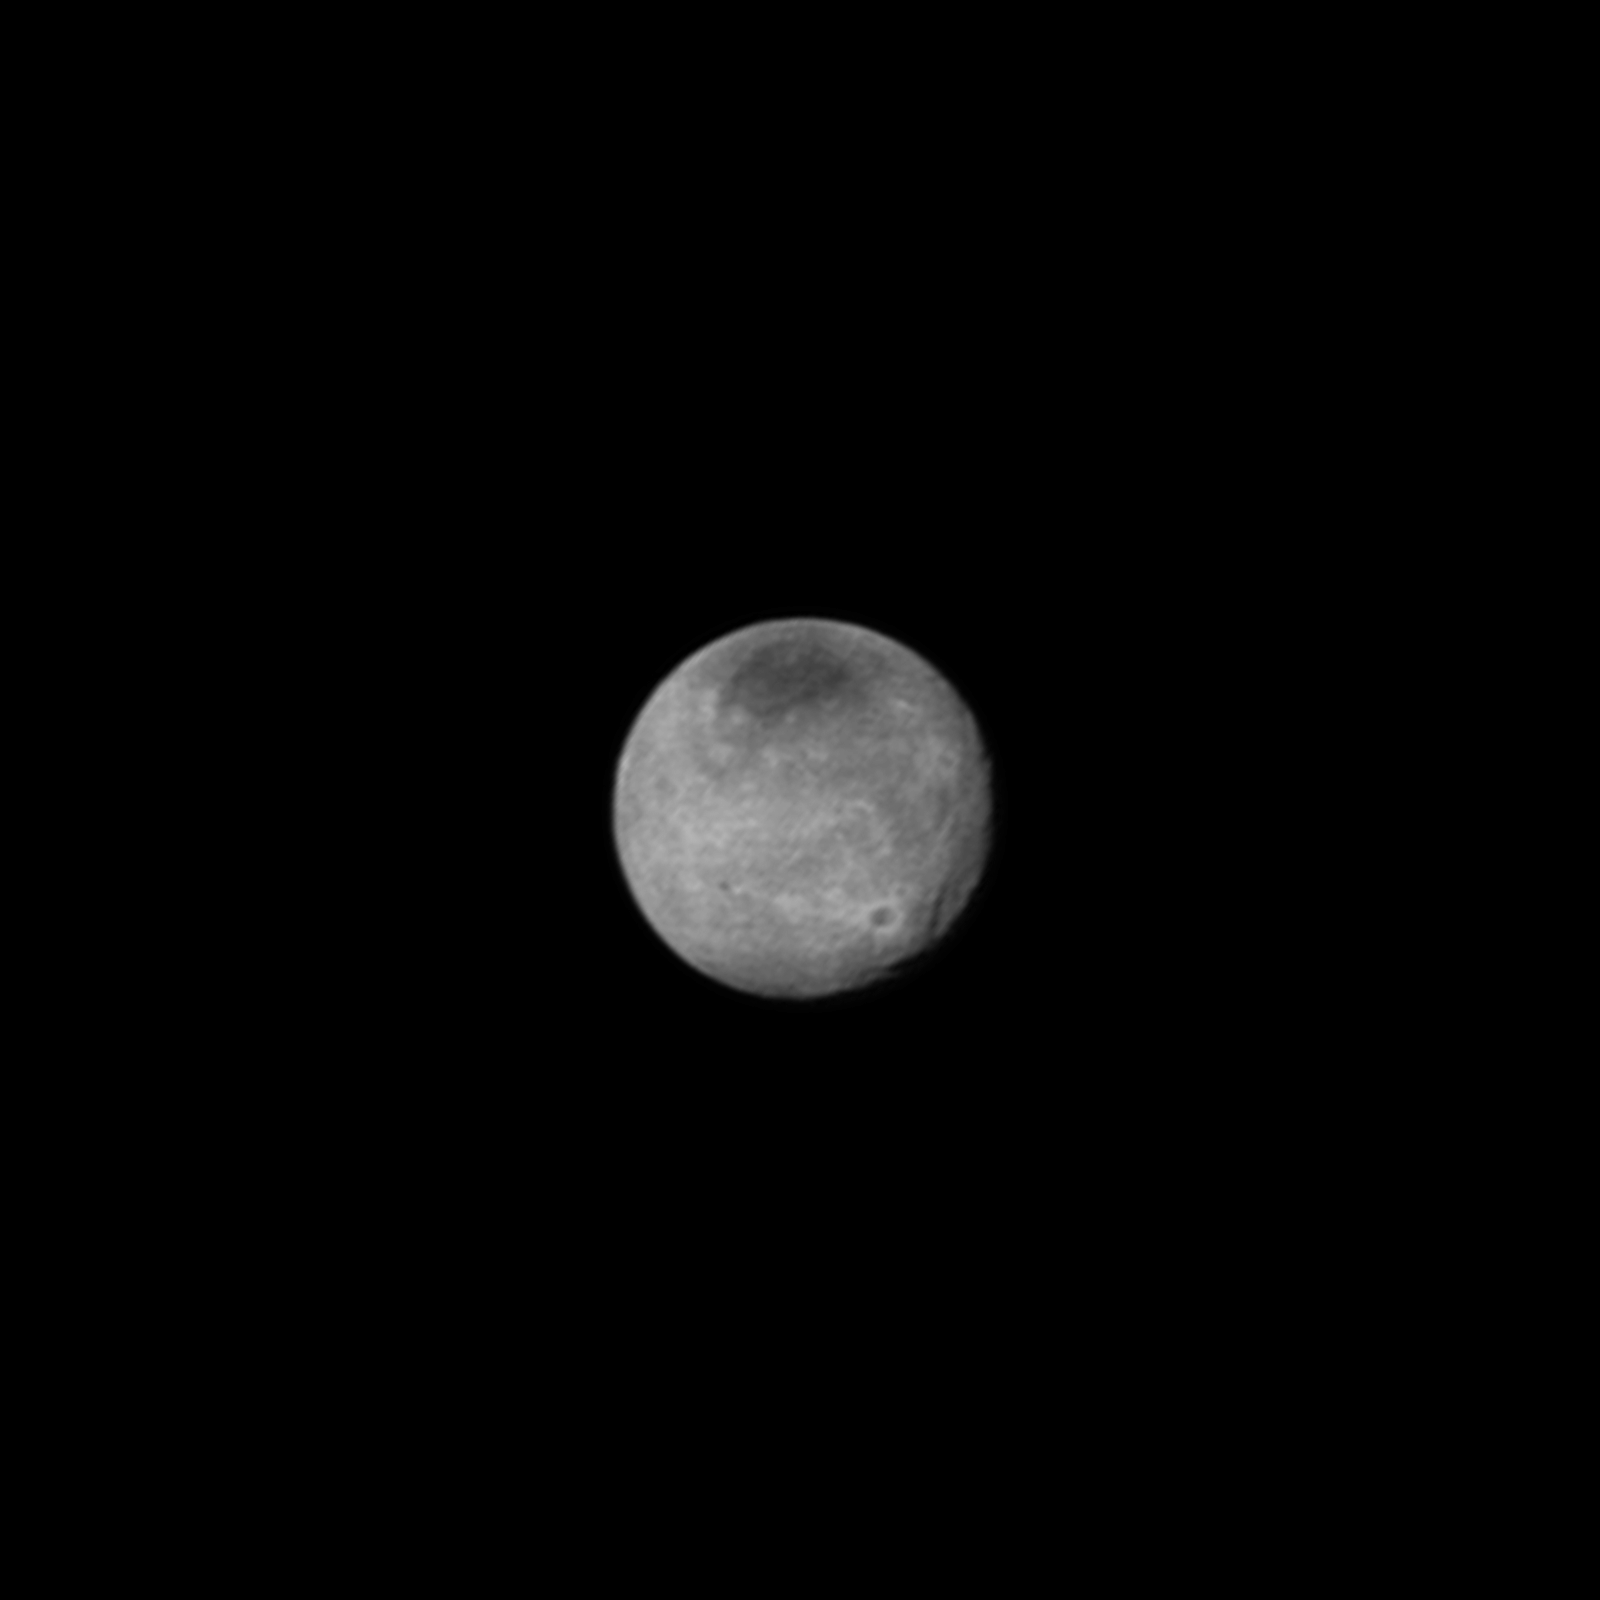 Charon am 12. Juli 2015